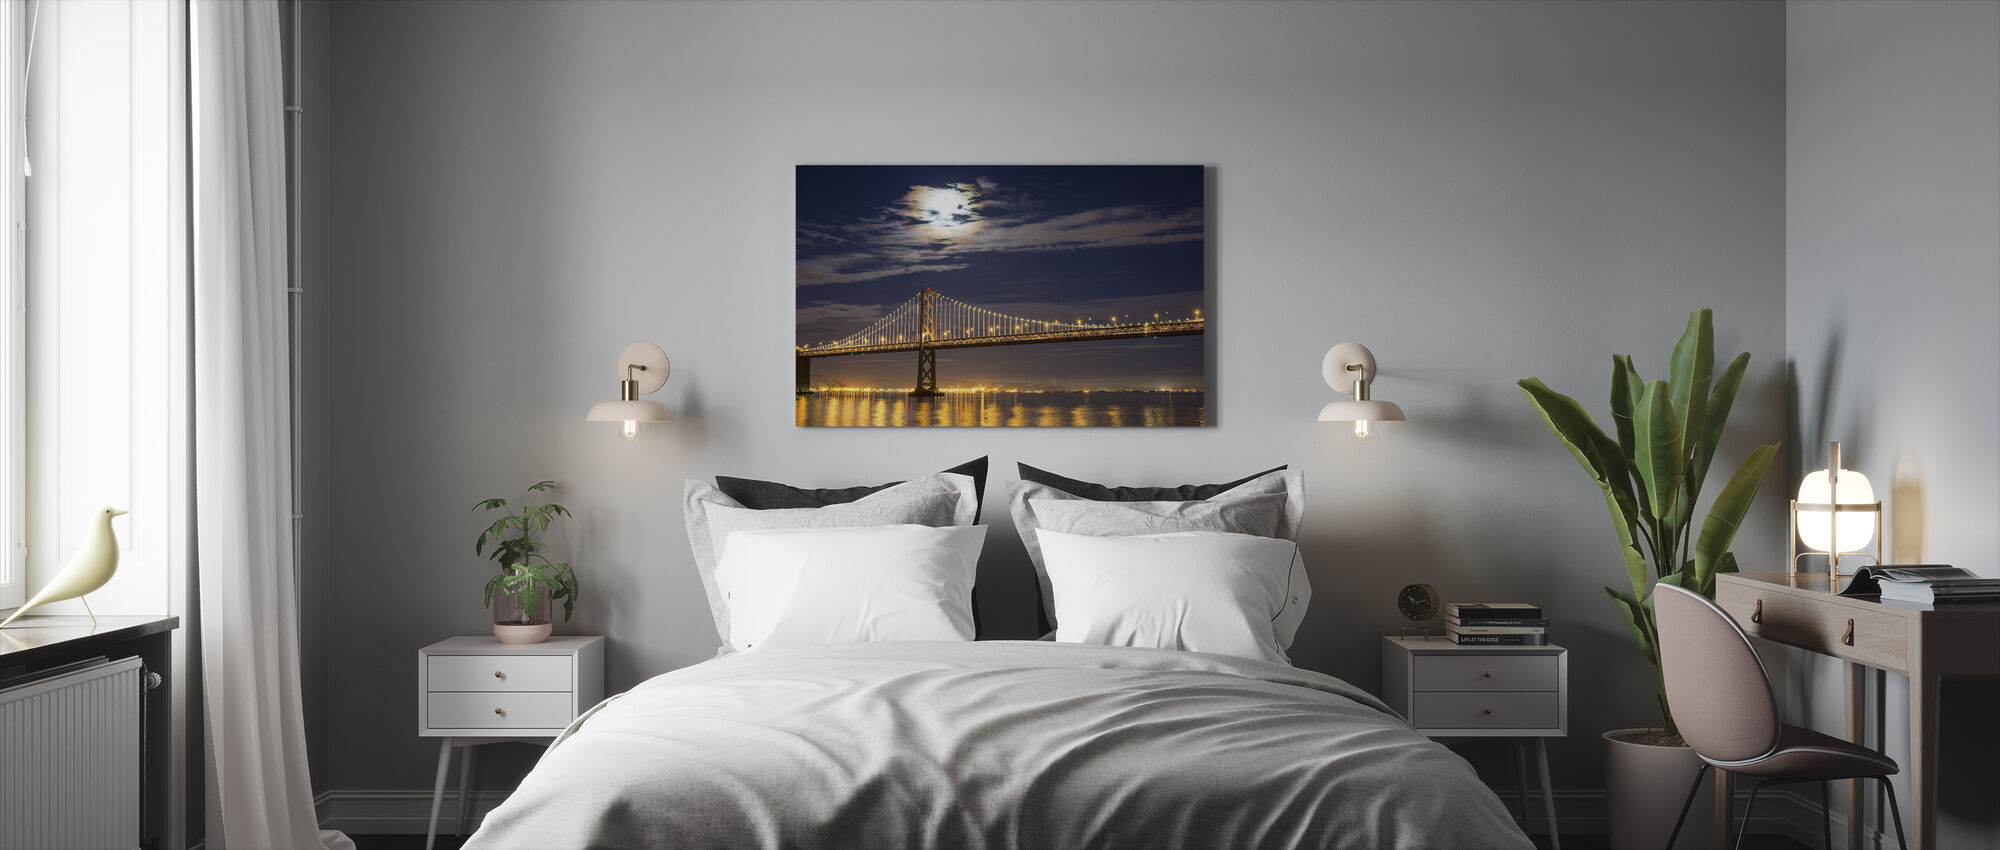 Moonrise over Bay Bridge - Canvas print - Bedroom